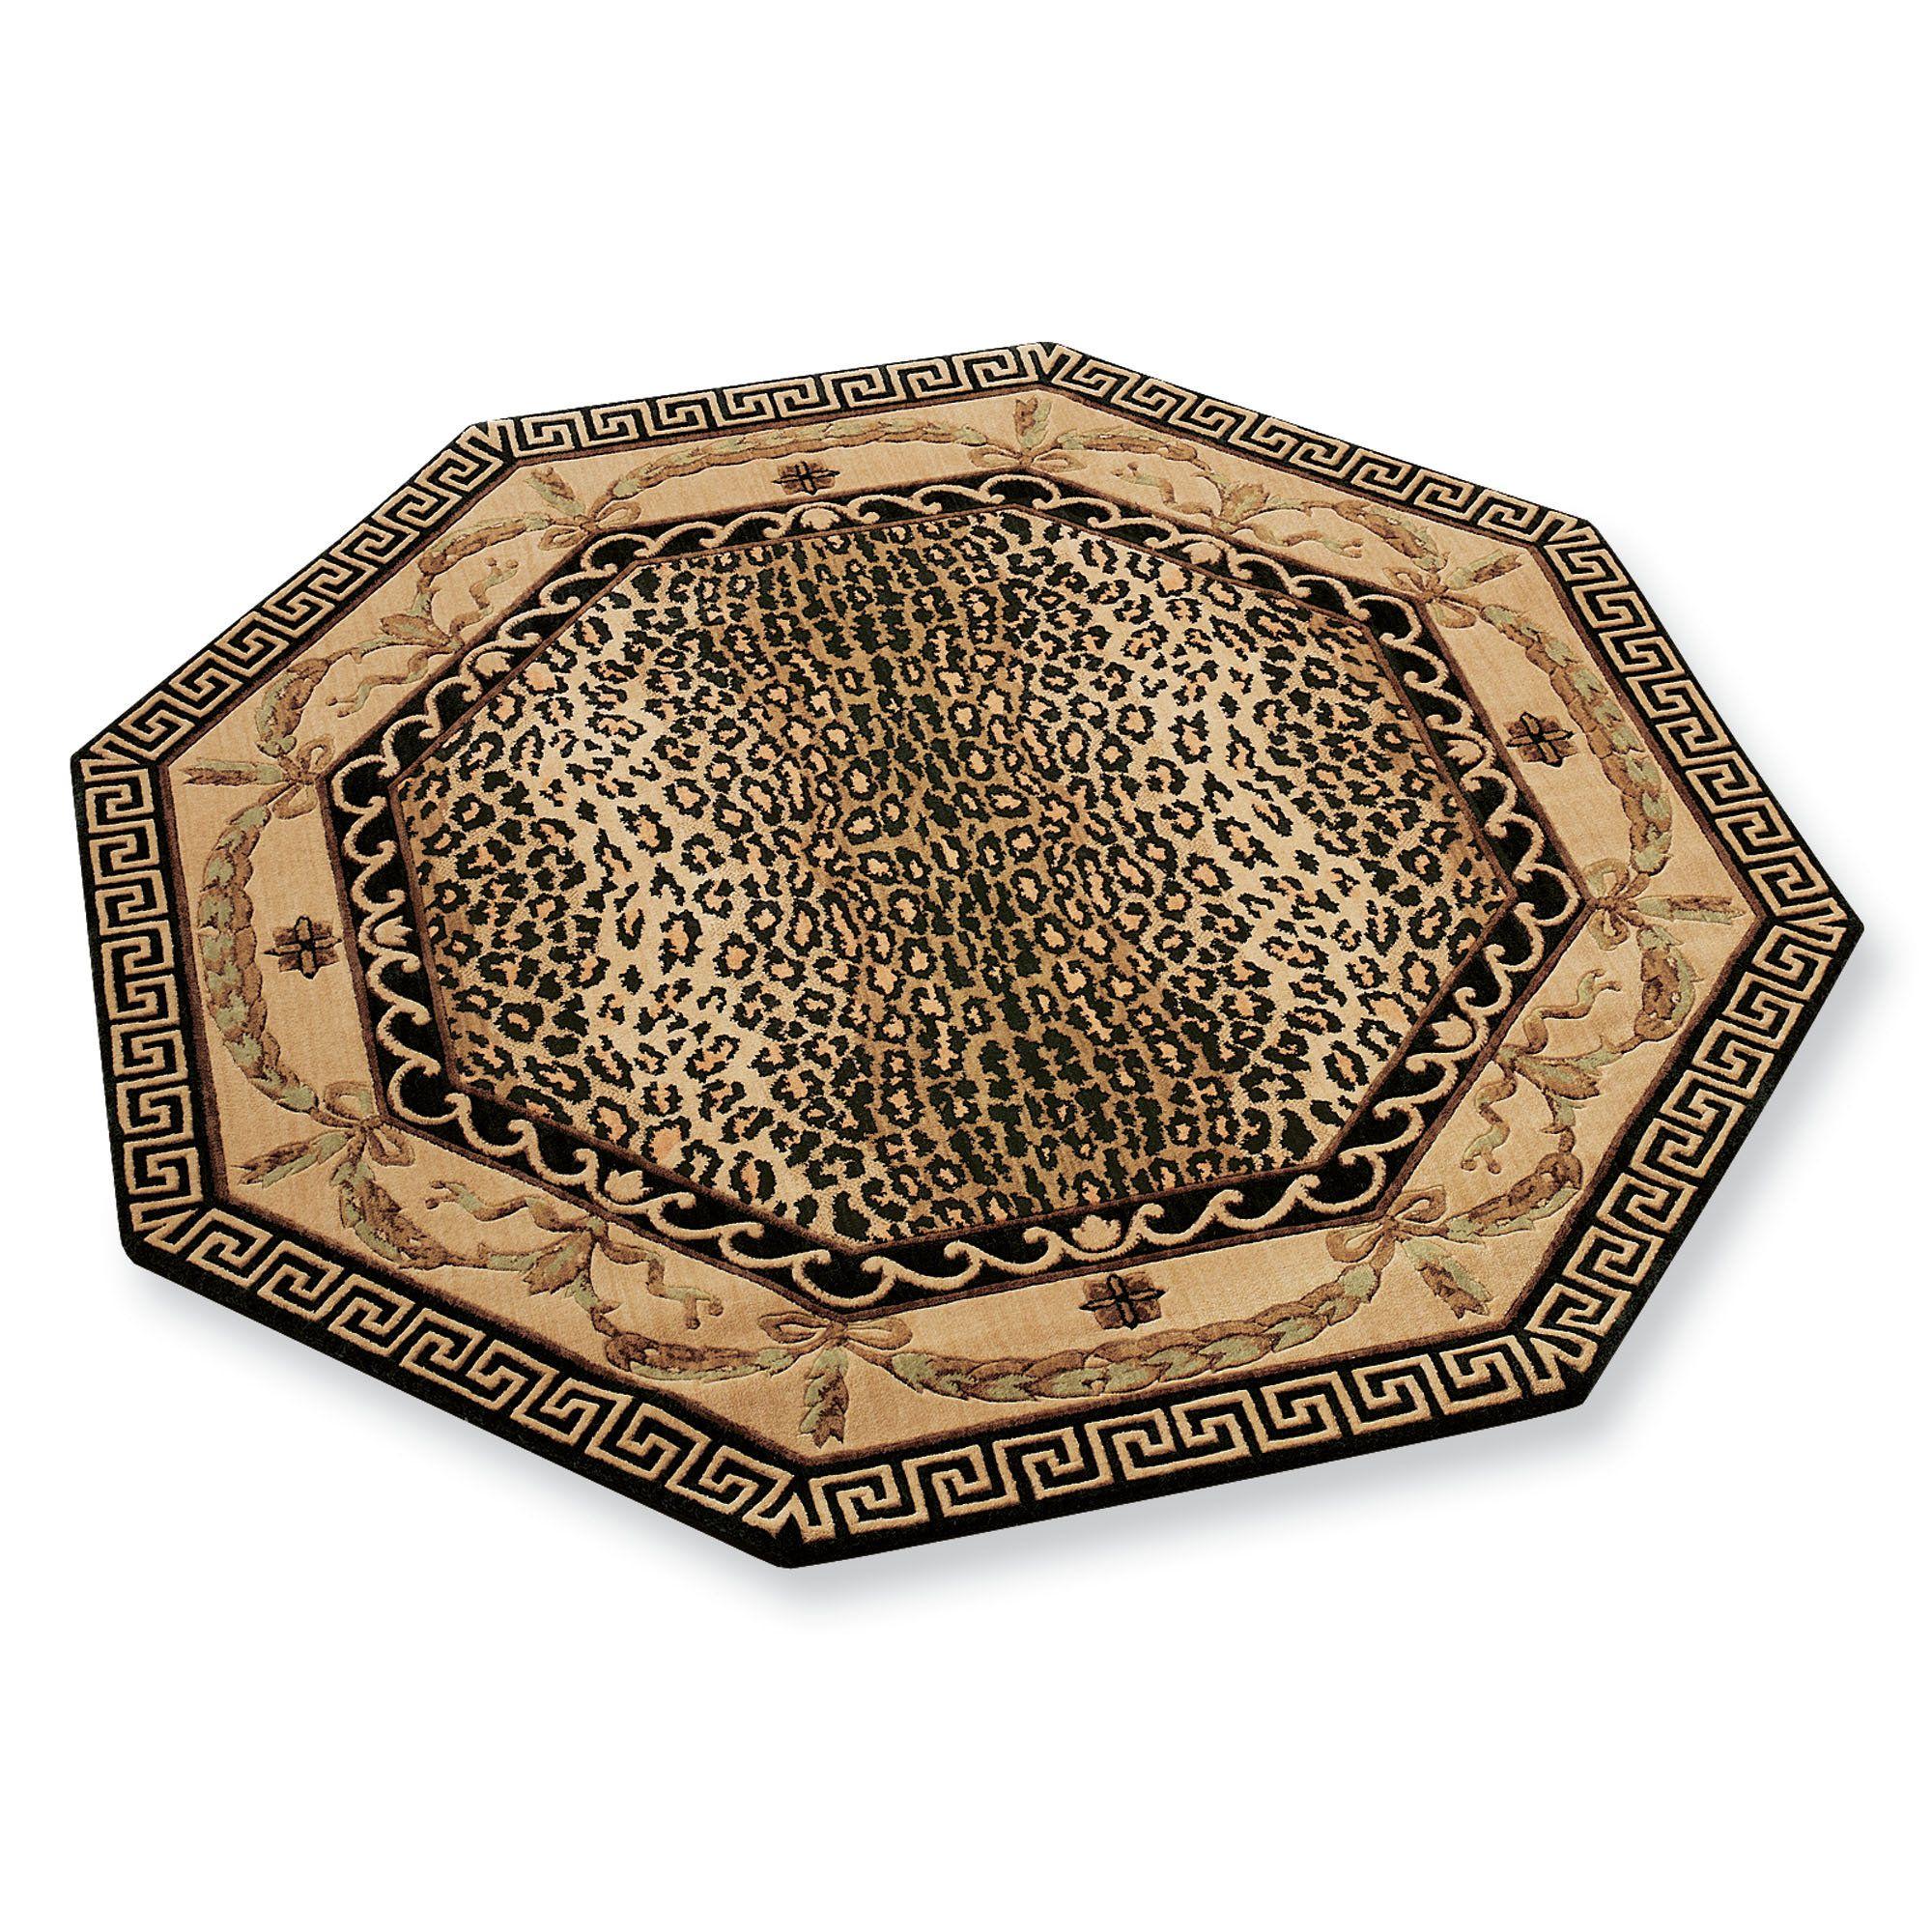 Leopard Print Rug In Dining Room: Bathroom Ideas Using Leopard Print